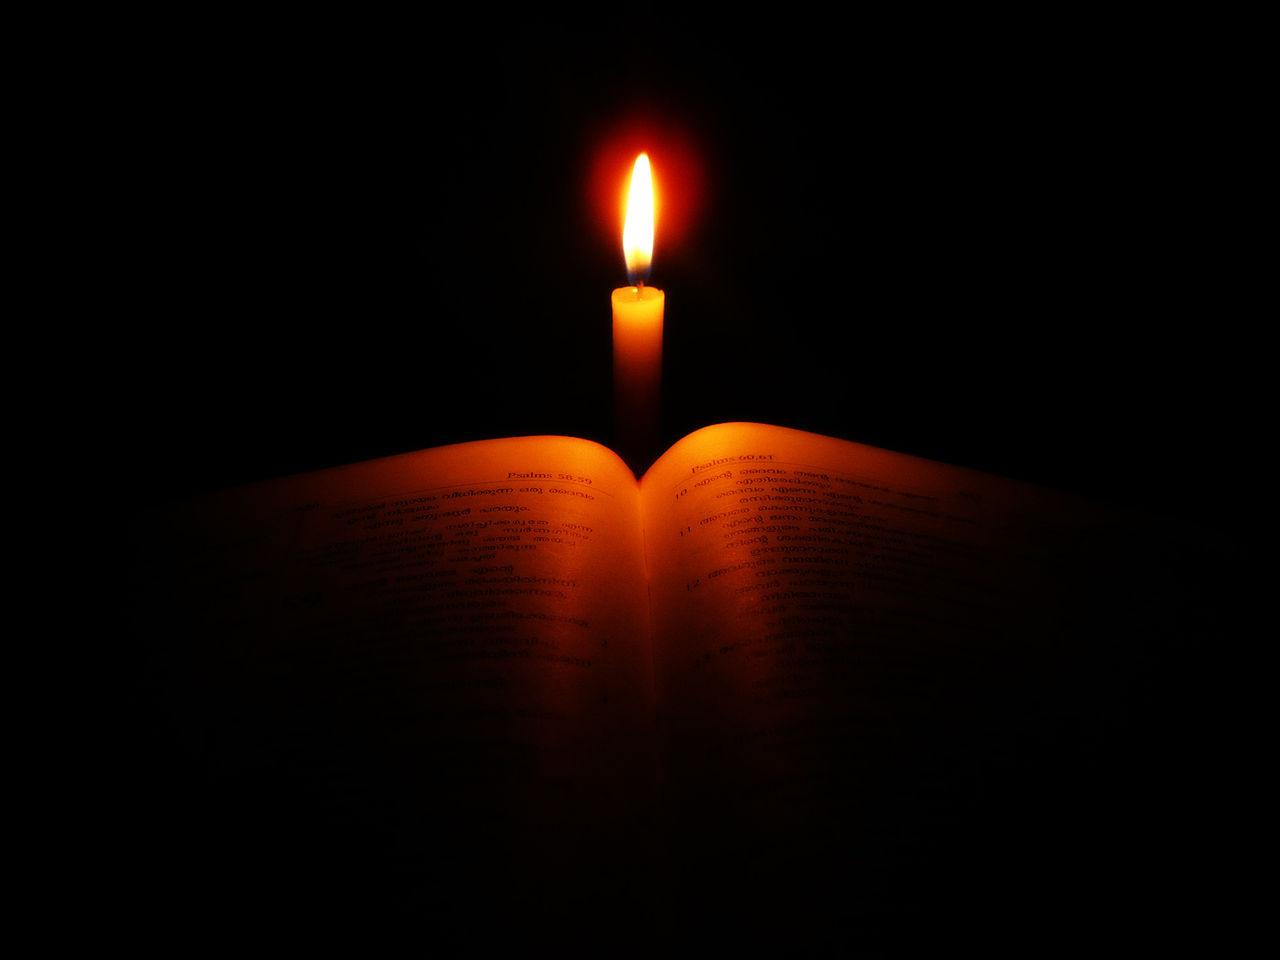 Risultati immagini per luce di dio